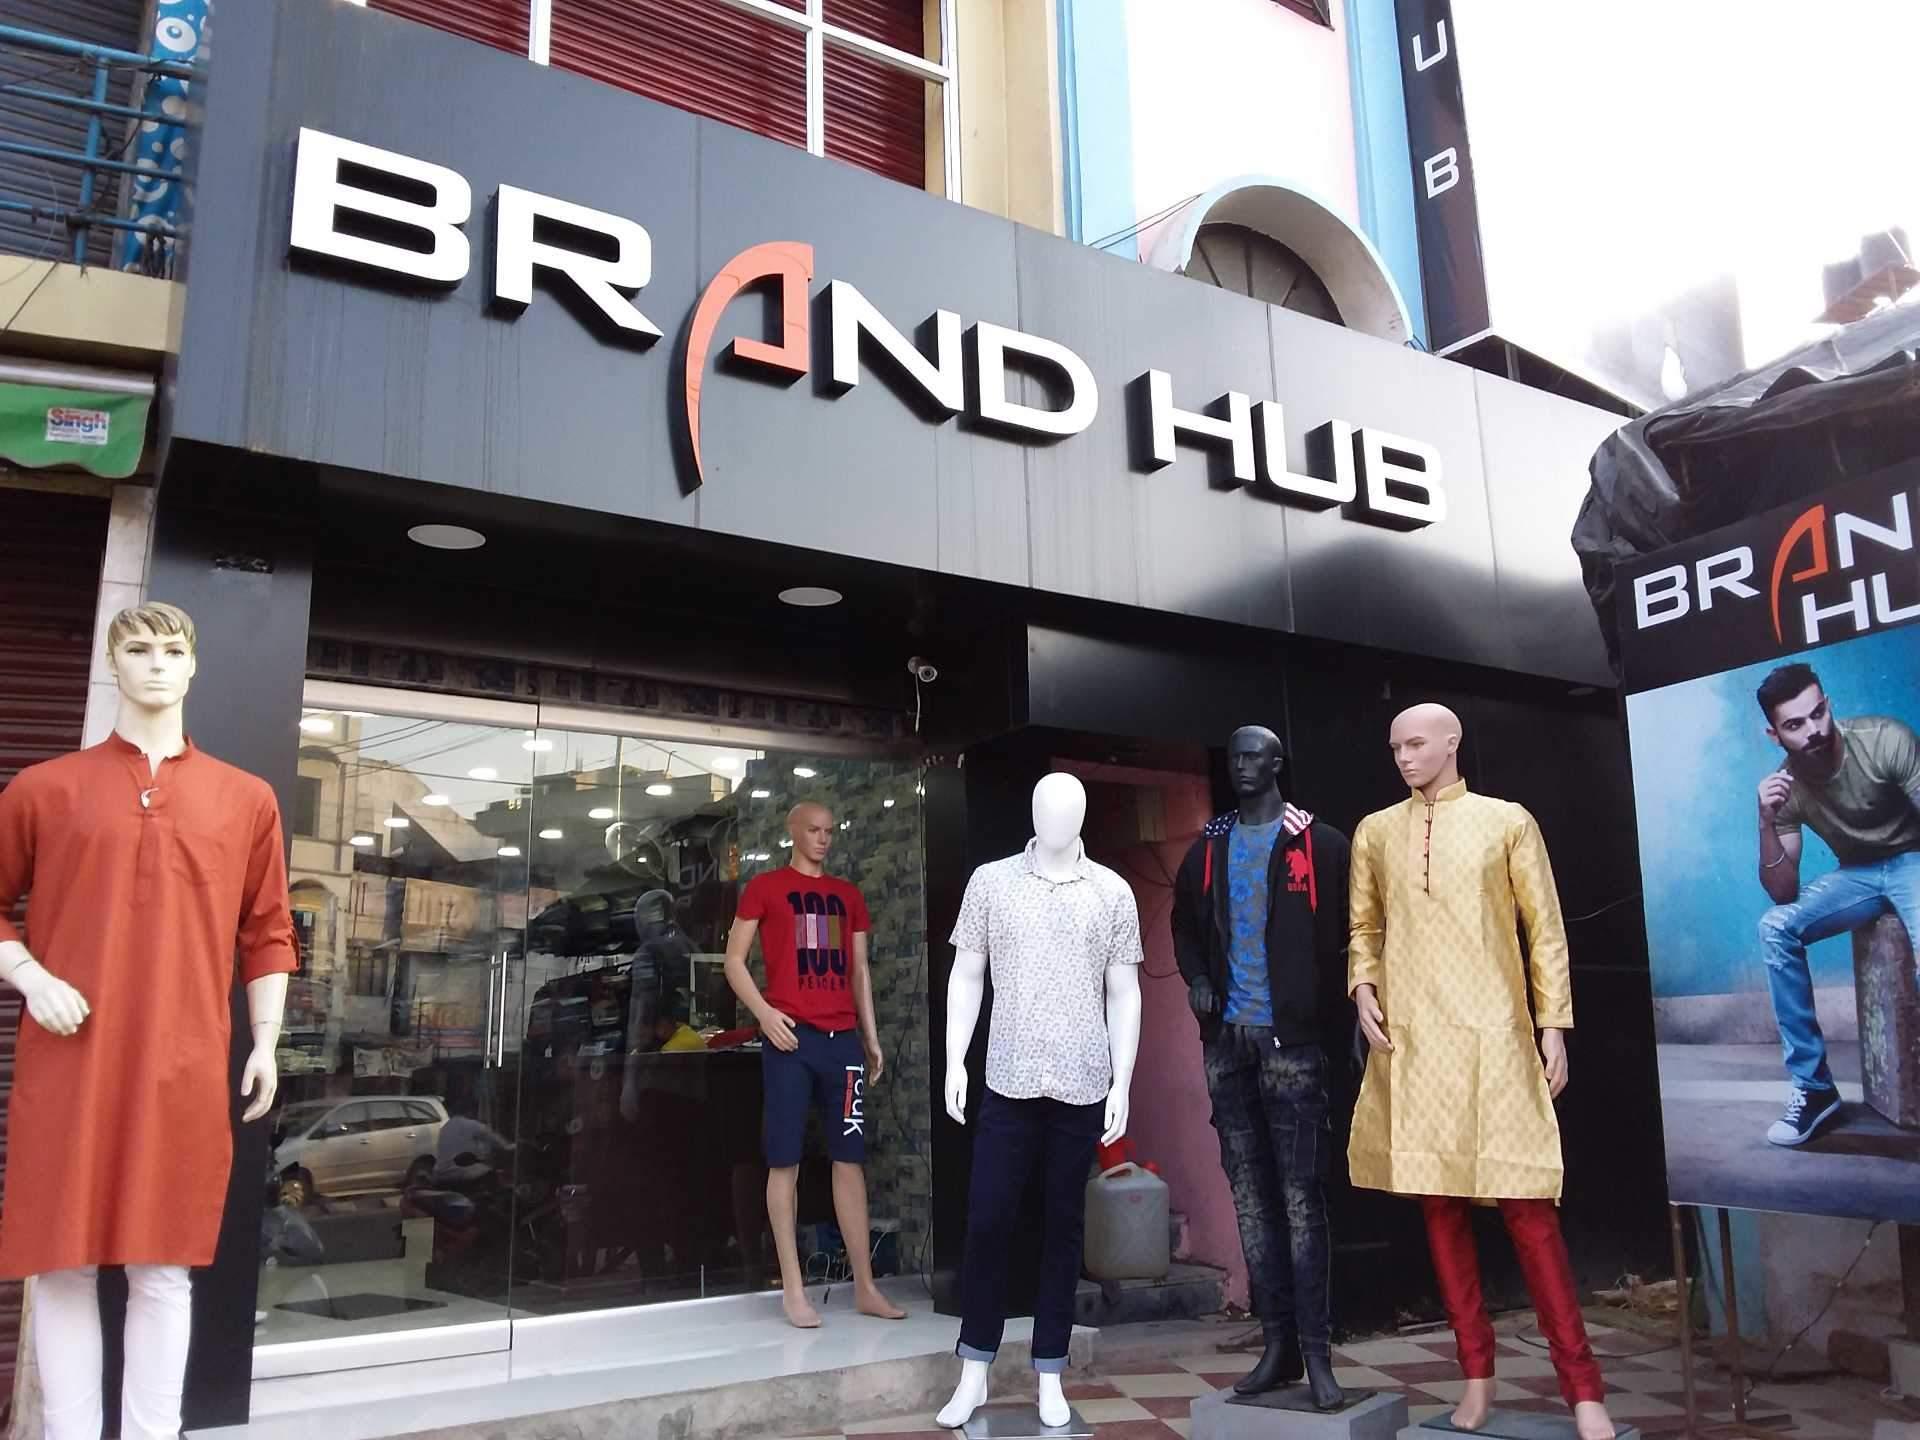 c636b6b1d4b Top 100 Gents Readymade Garment Retailers in Warangal - Best ...